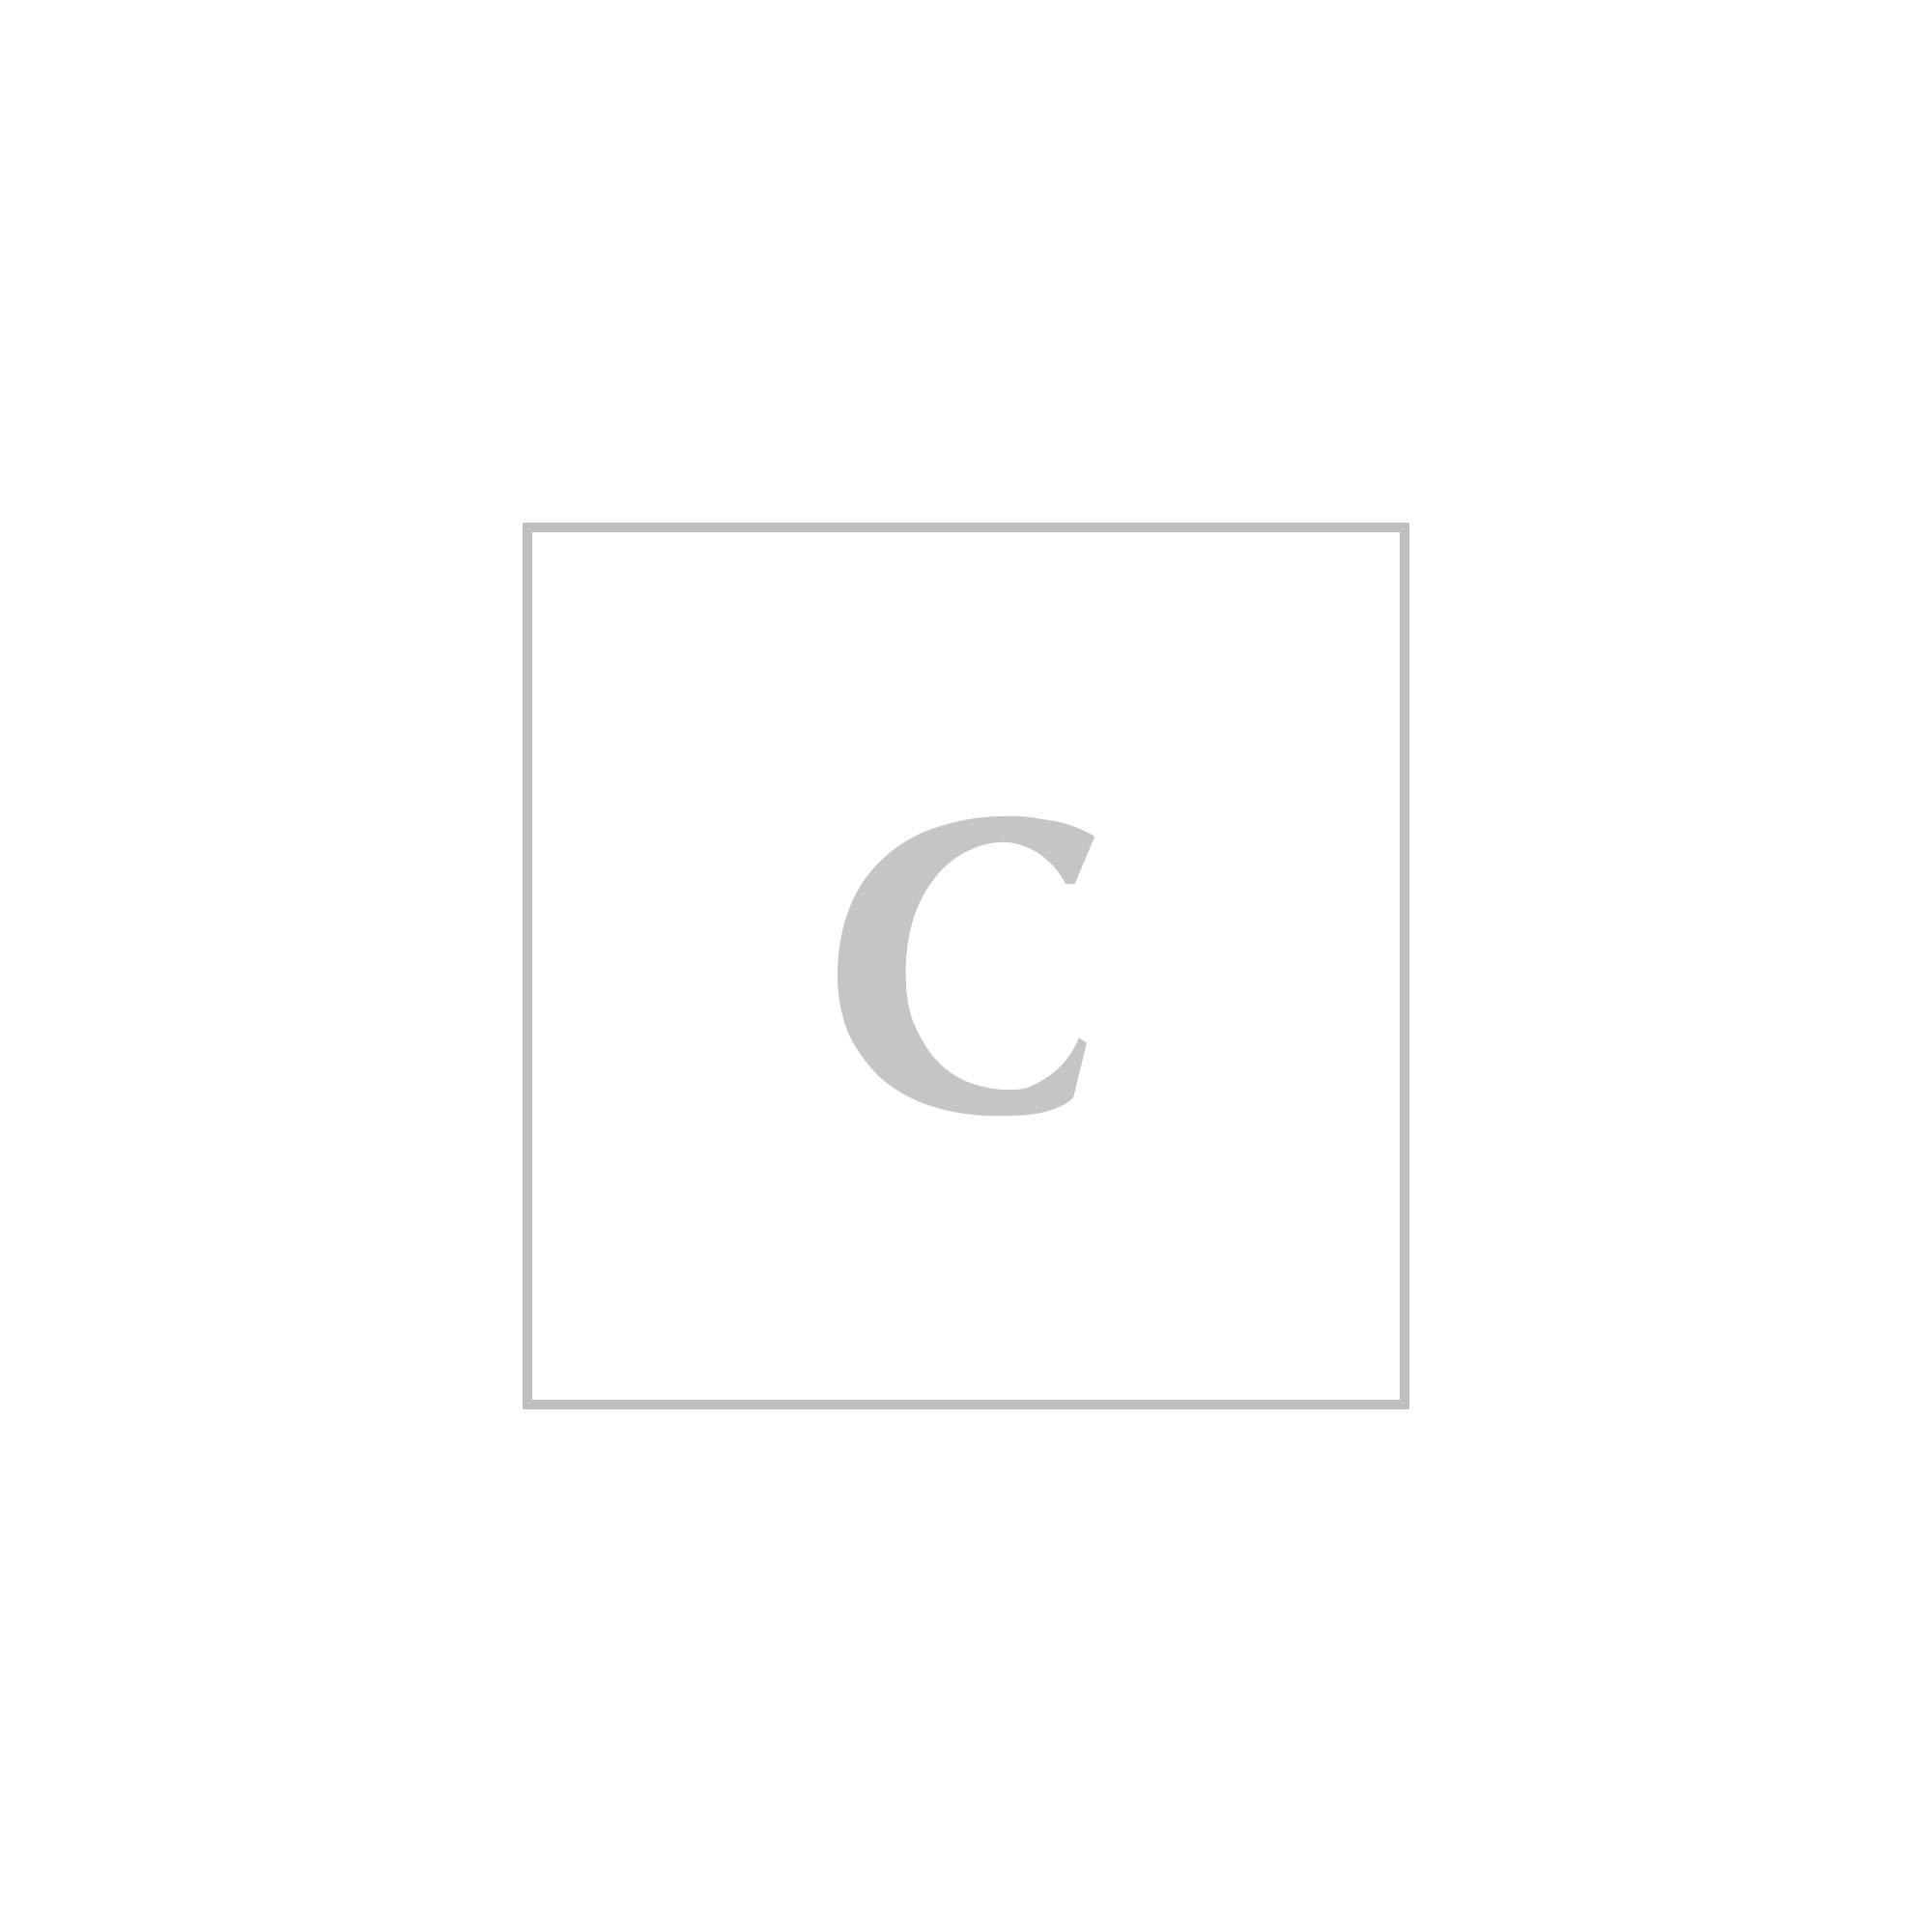 Dolce & gabbana embossed calfskin keychain